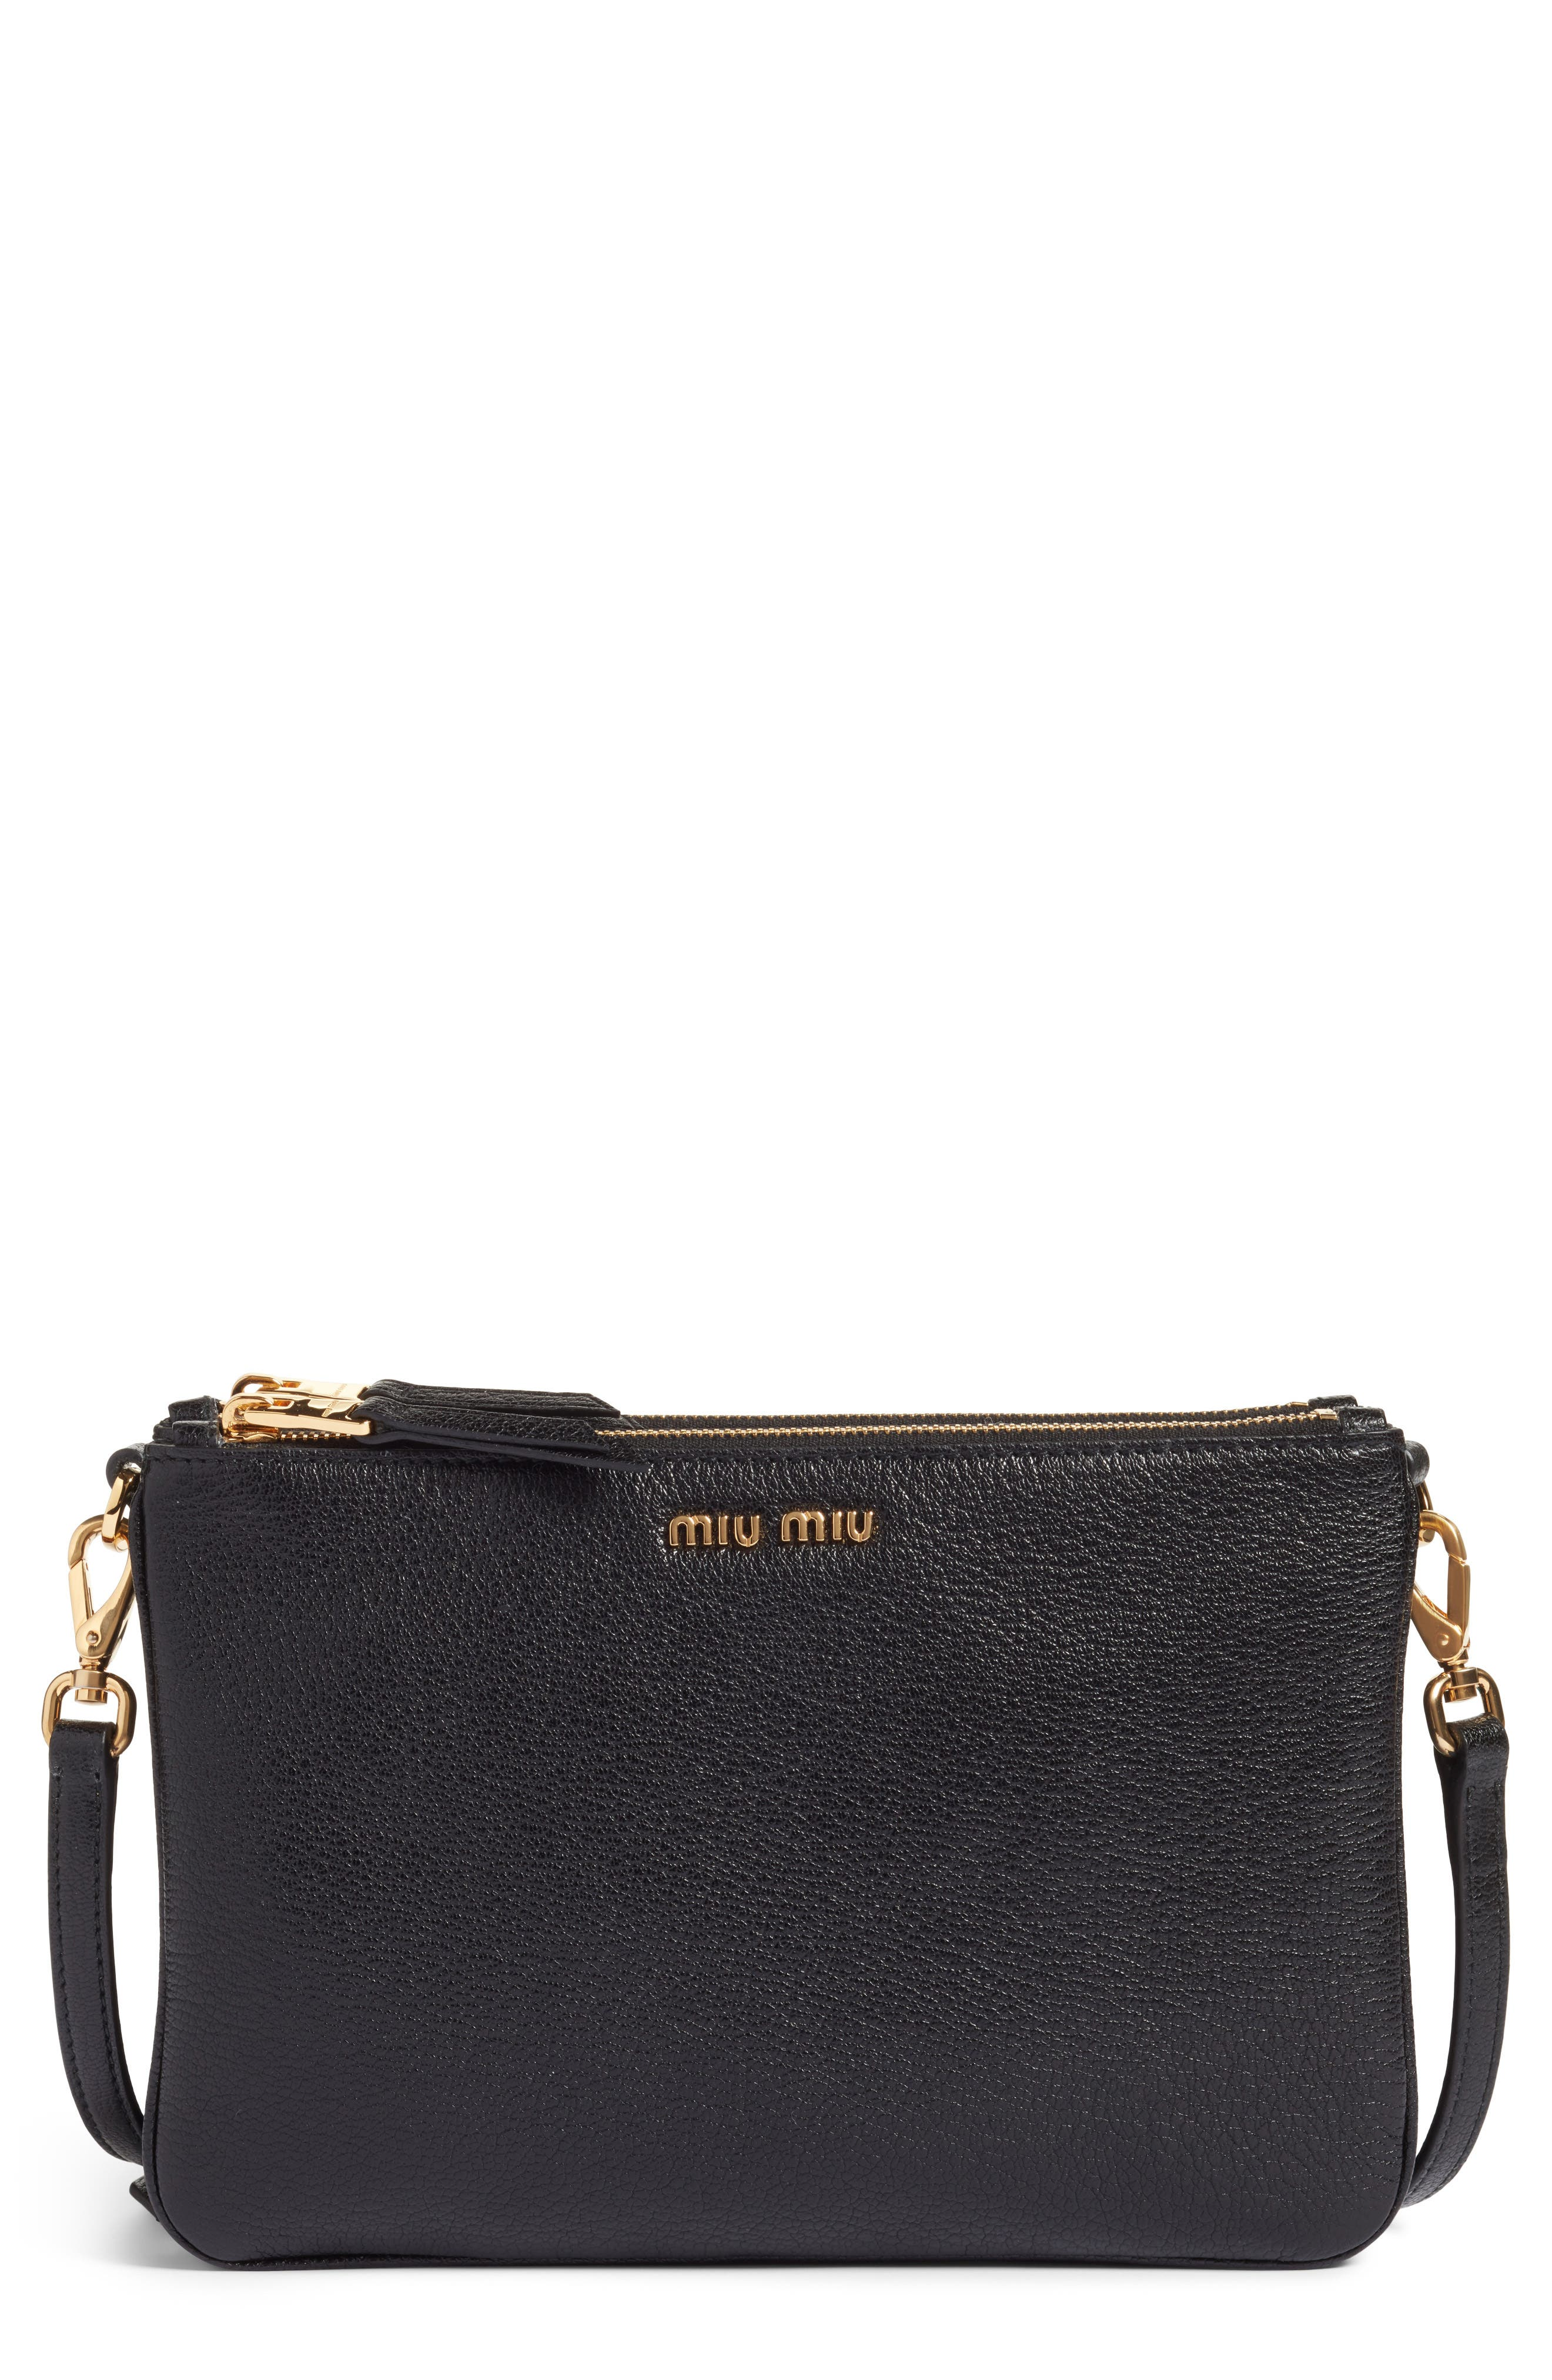 Miu Miu Madras Leather Crossbody Bag